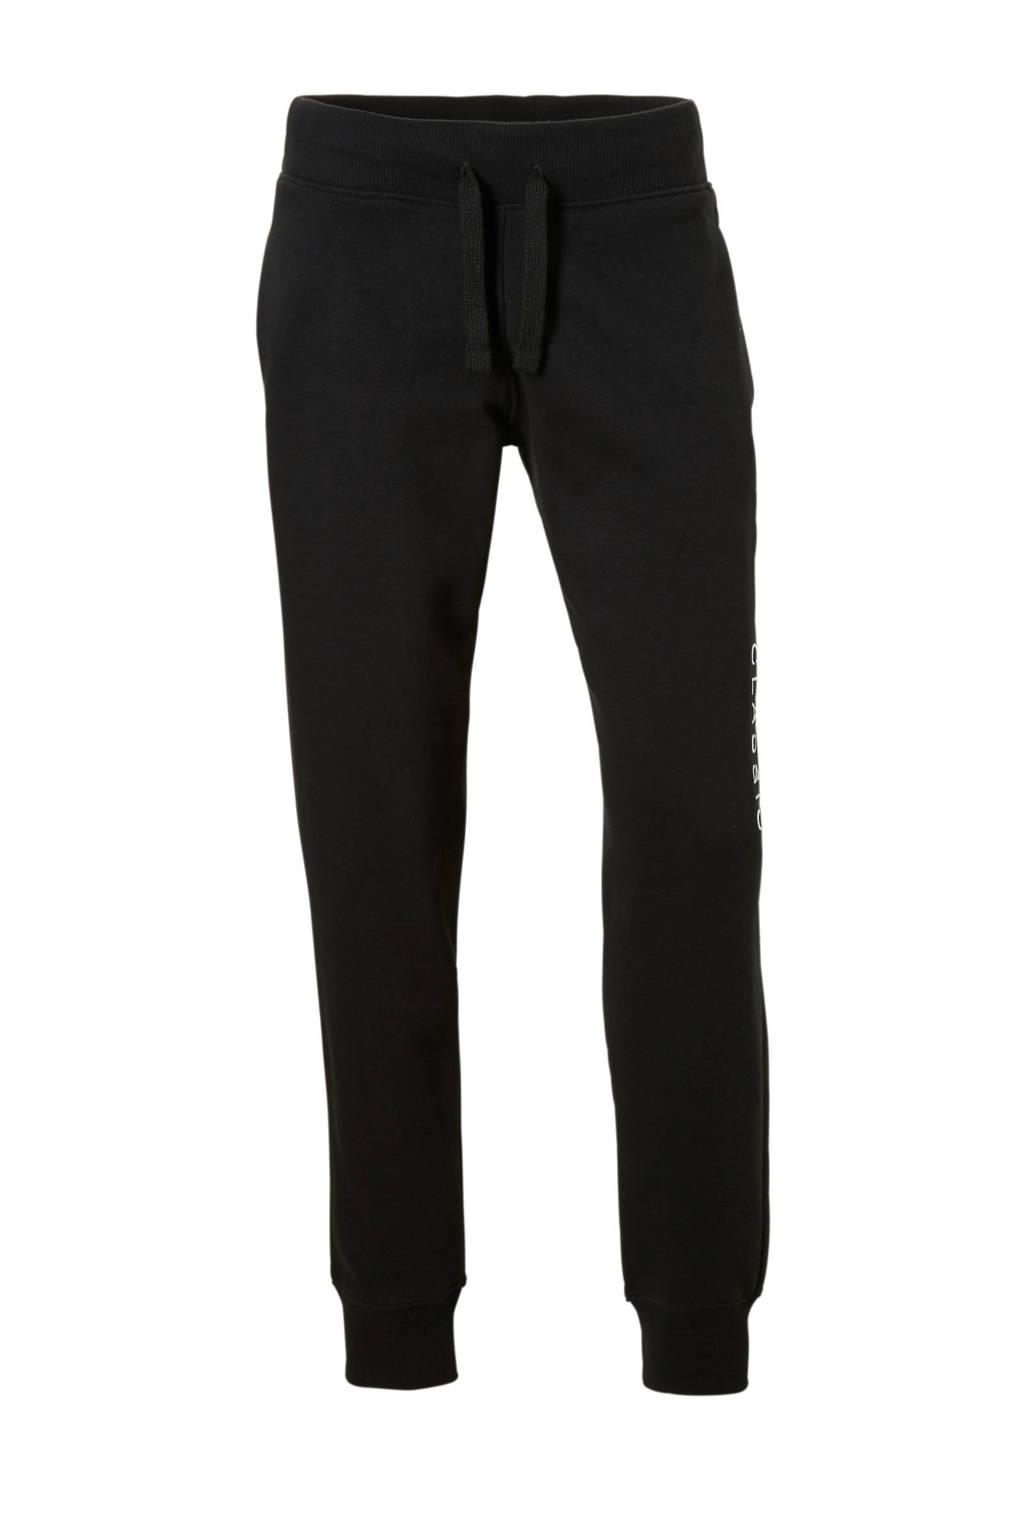 Reebok Classics broek zwart, Zwart